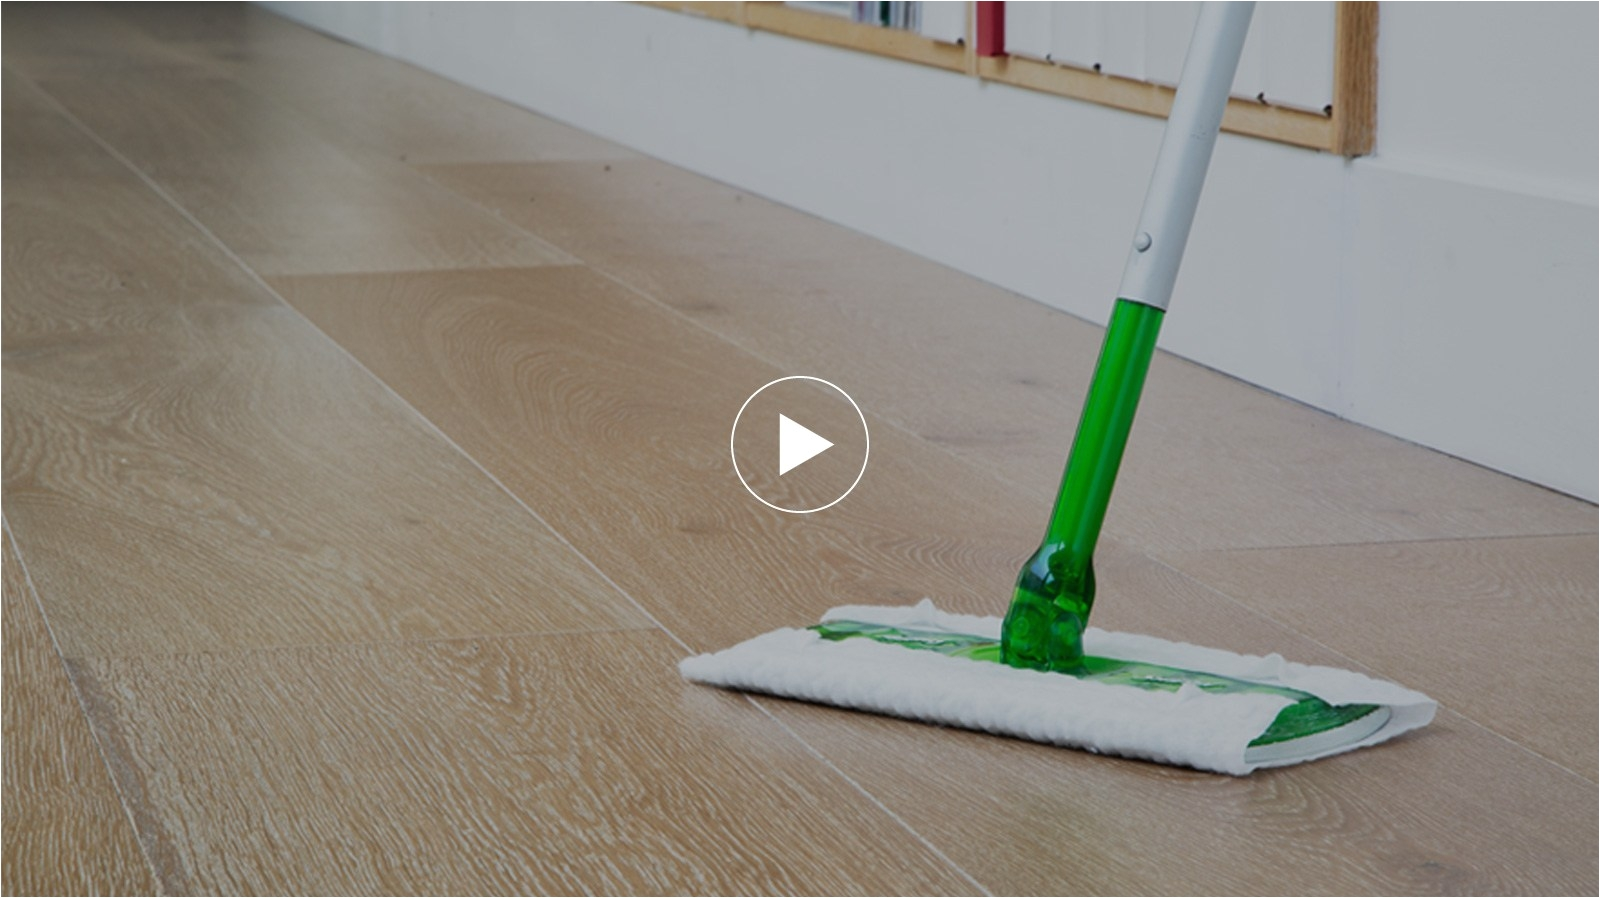 Best Mop to Clean Hardwood Floors Splendiferous Ing Way to Clean Wood S Bona Hardwood for